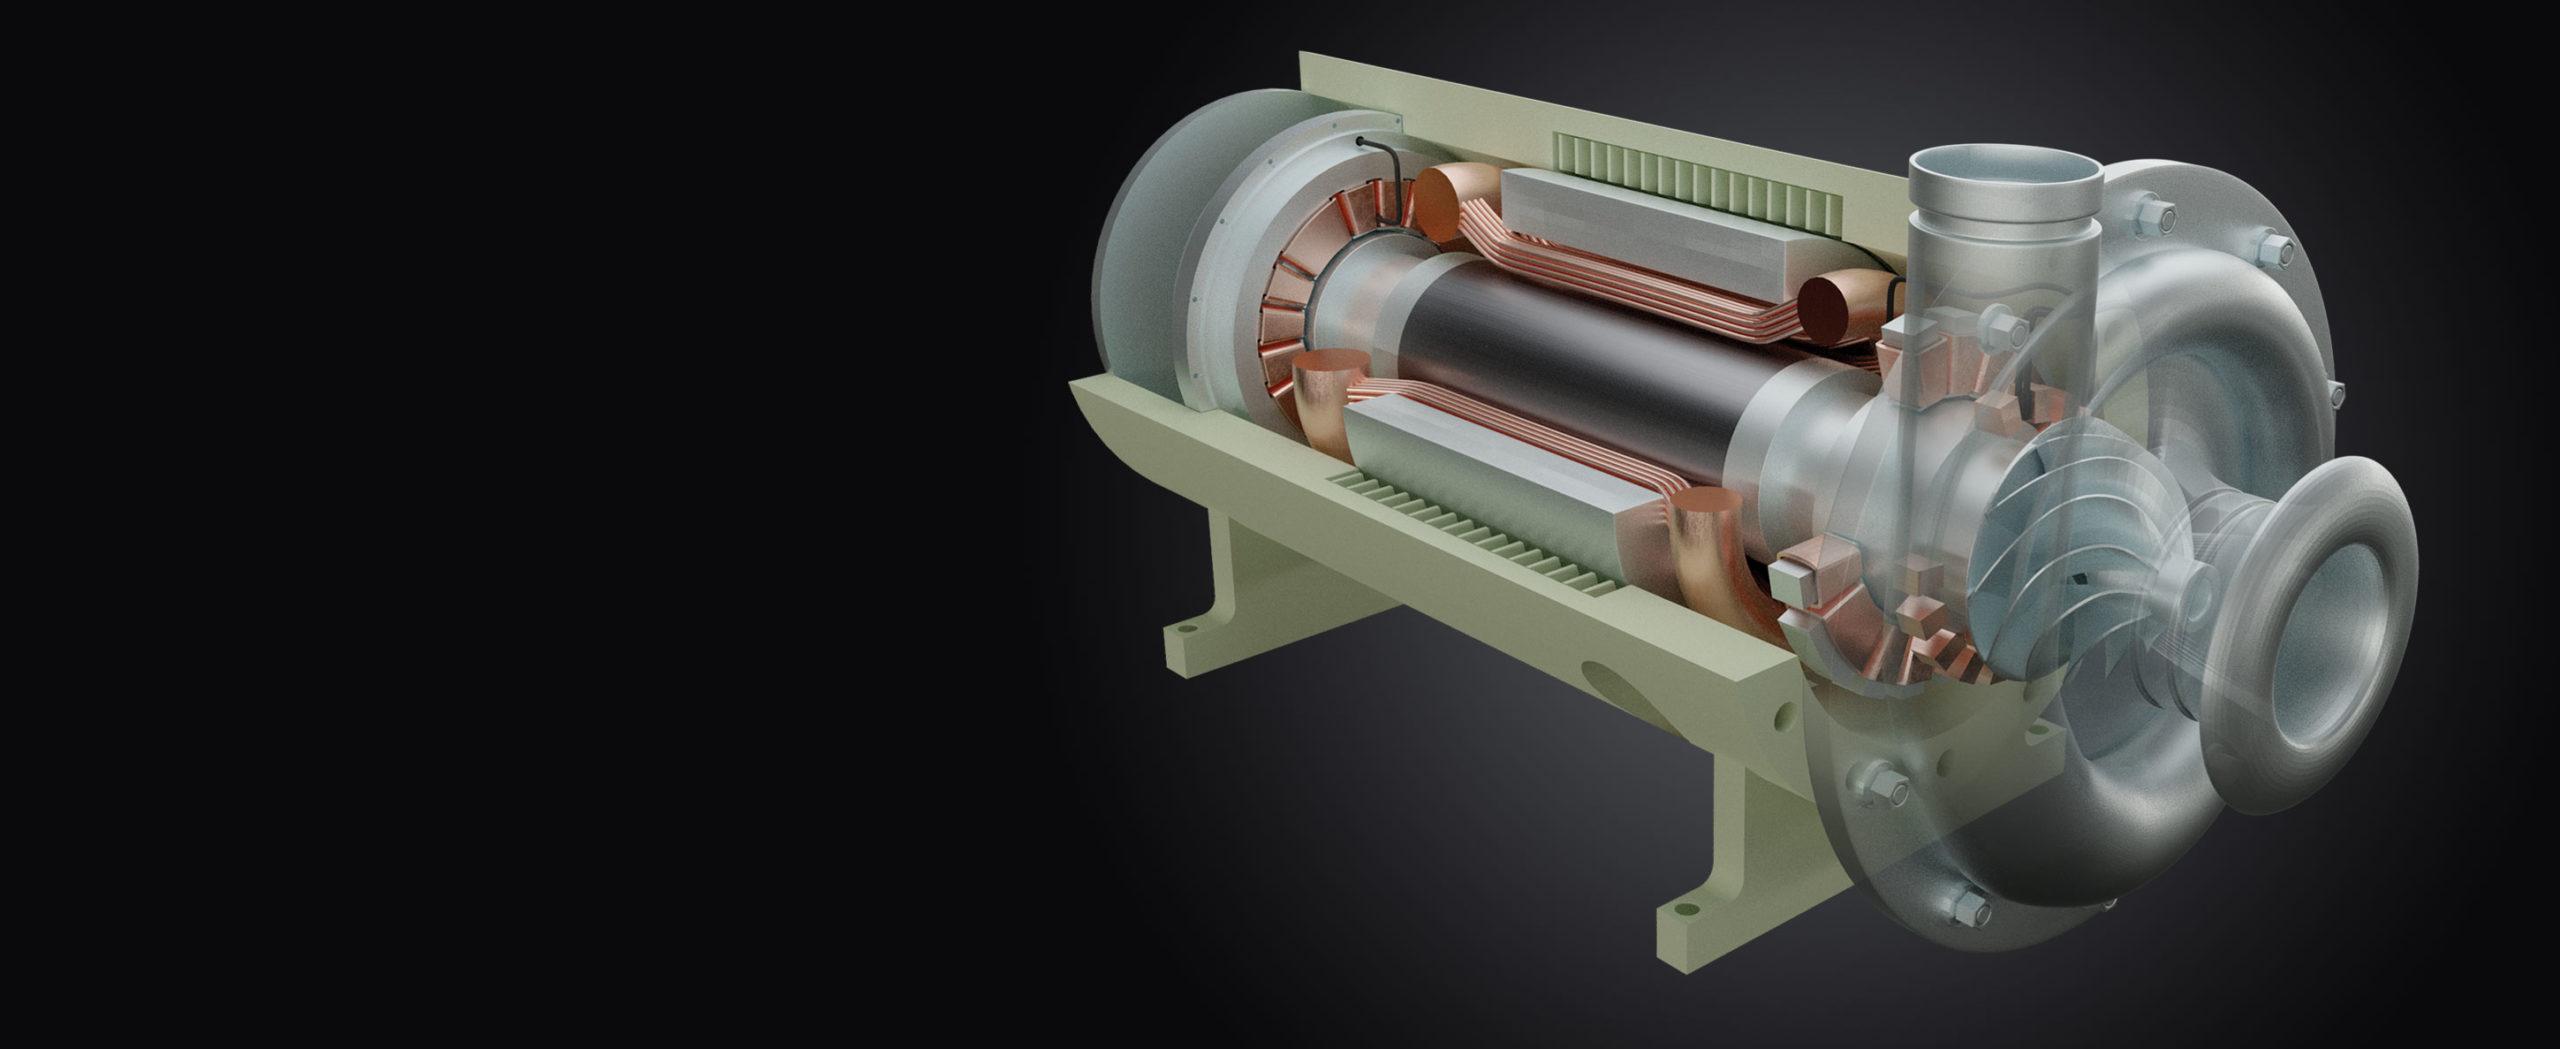 Turbine technical illustration   3D Printing Branding   Toolbox Creative